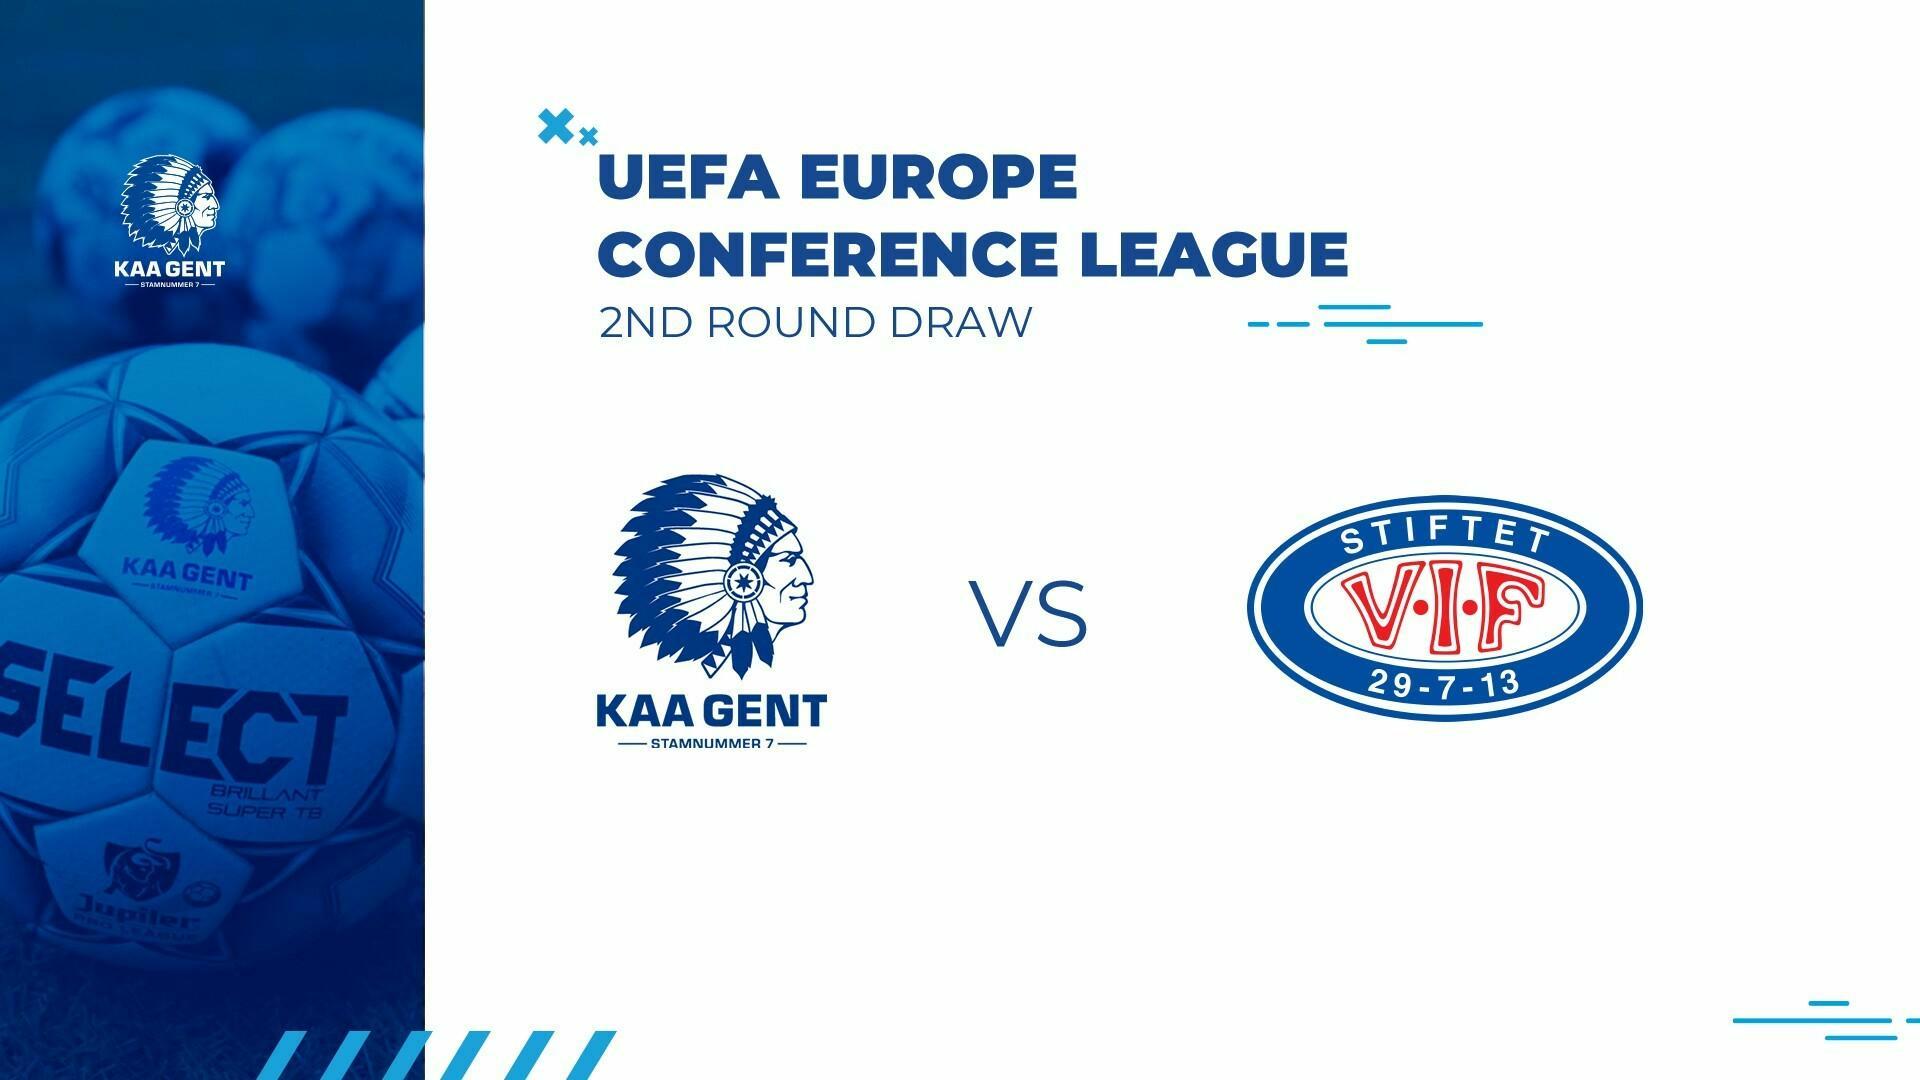 KAA Gent loot Vålerenga in 2e voorronde Conference League